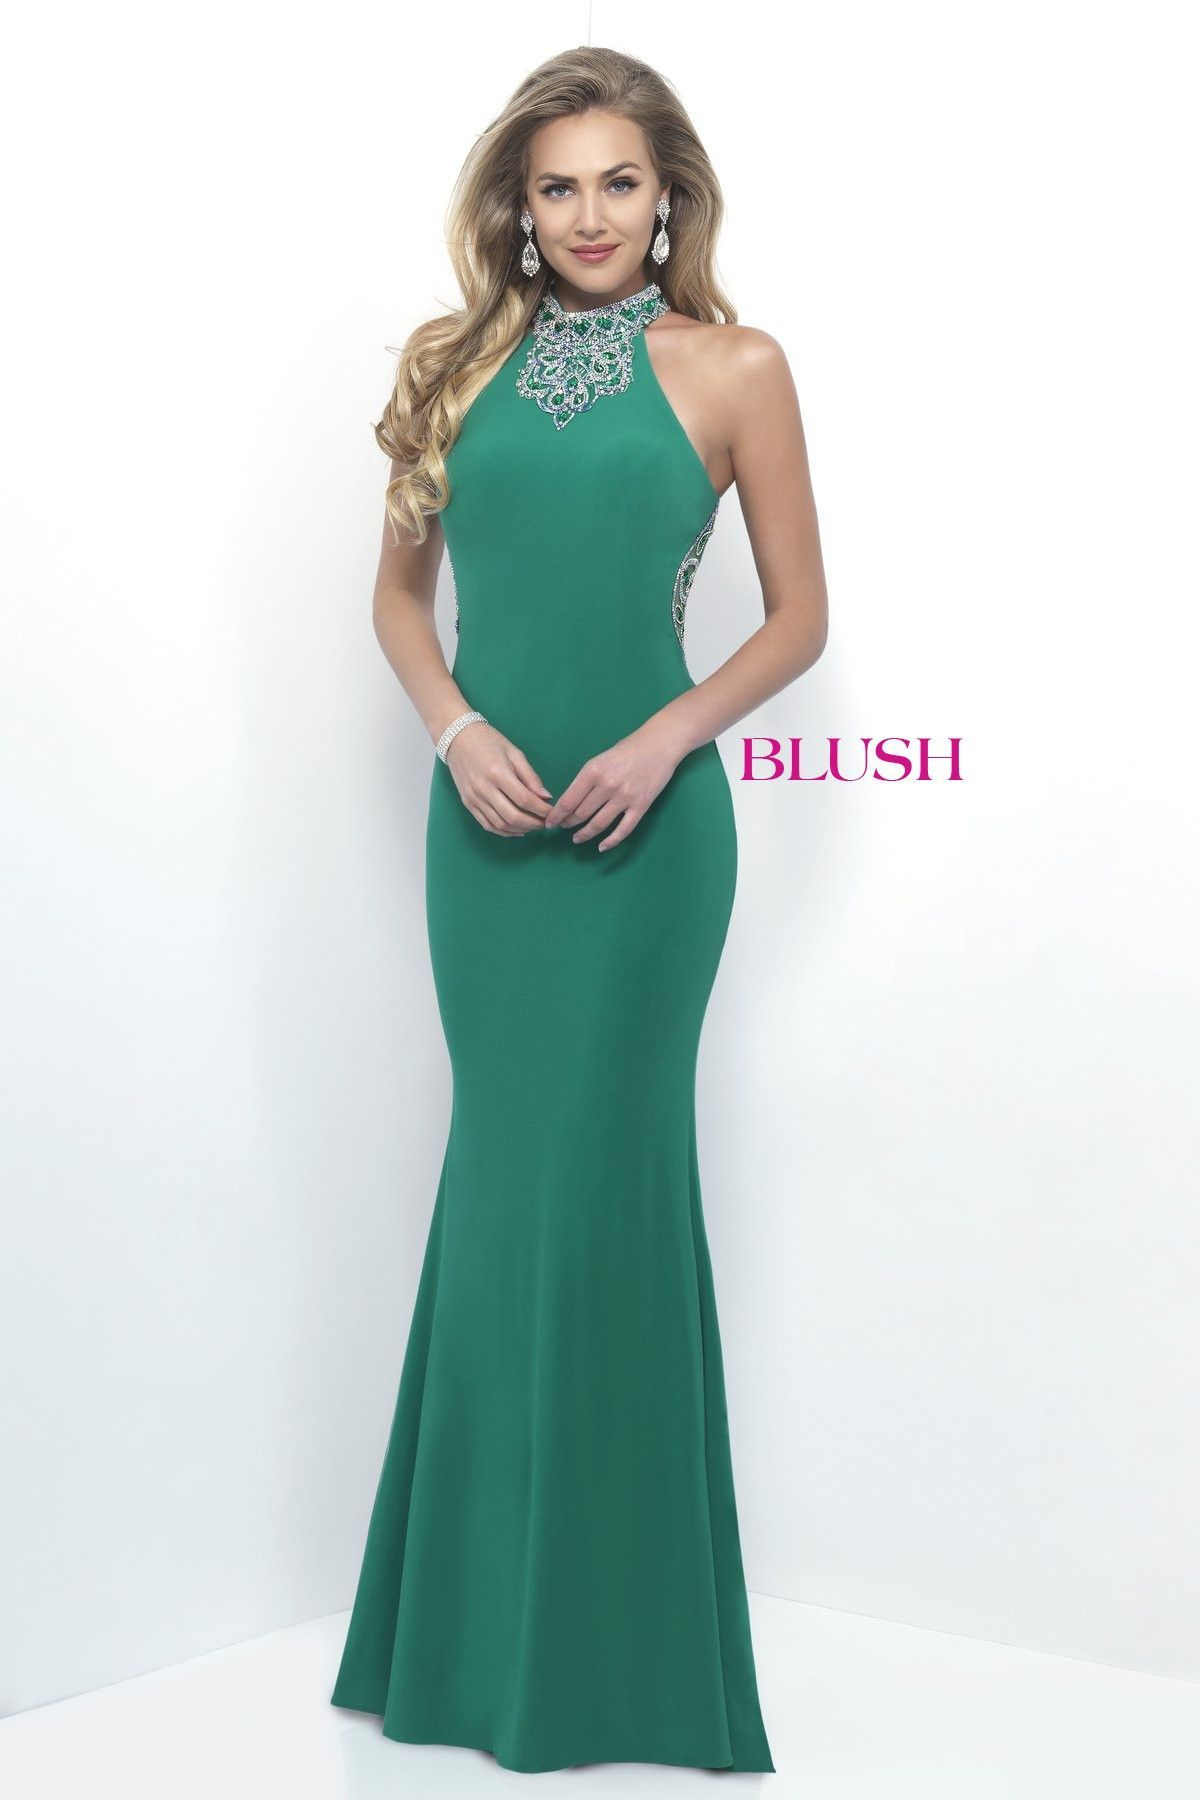 Blush Prom 11307 Emerald High Neckline Prom Dress | Products ...